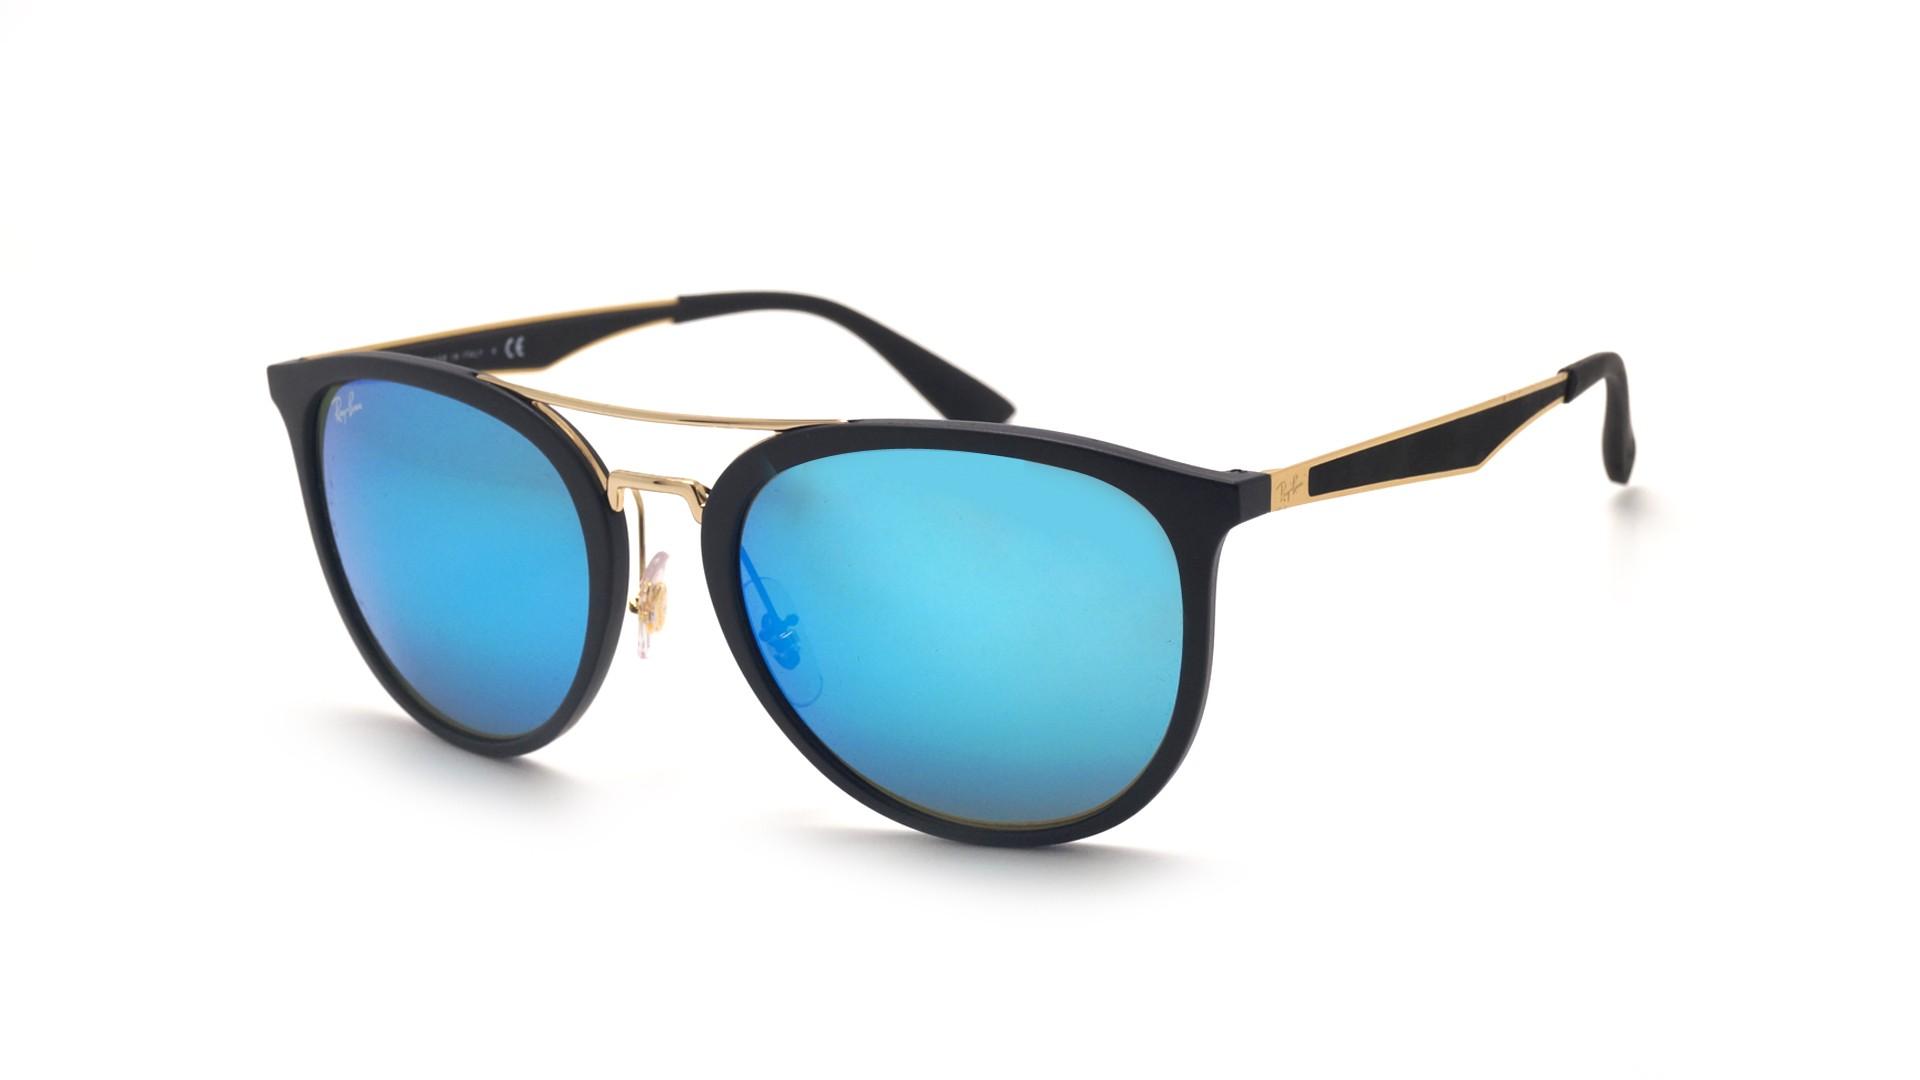 c36ddd6769 Sunglasses Ray-Ban RB4285 601S55 55-20 Black Matte Large Mirror